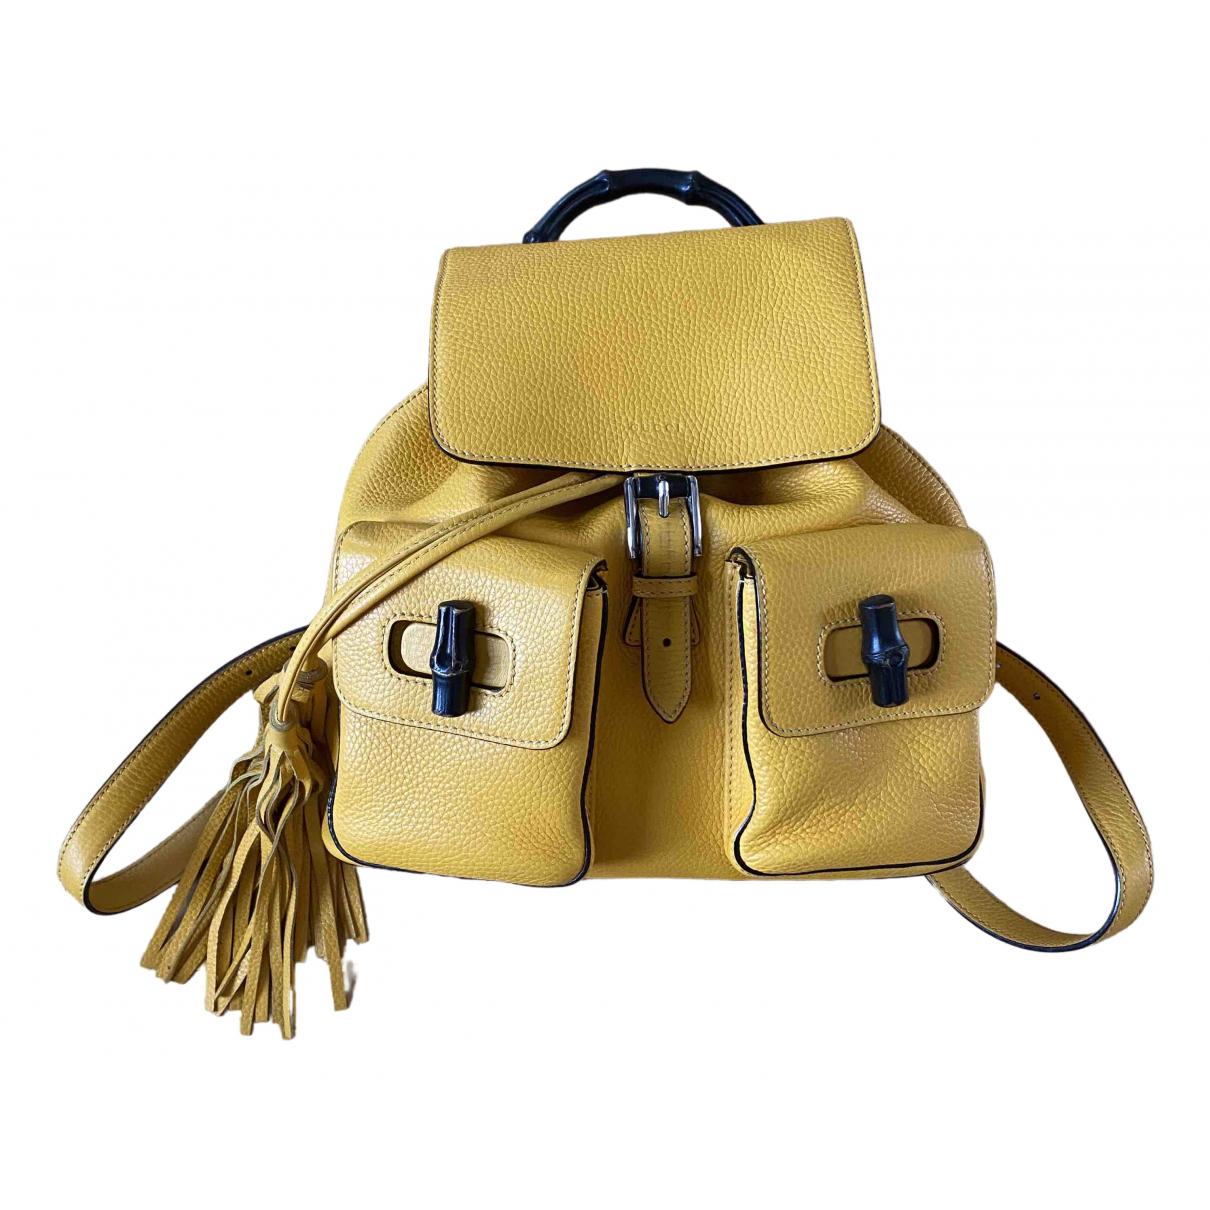 Gucci Bamboo Rucksaecke in  Gelb Leder